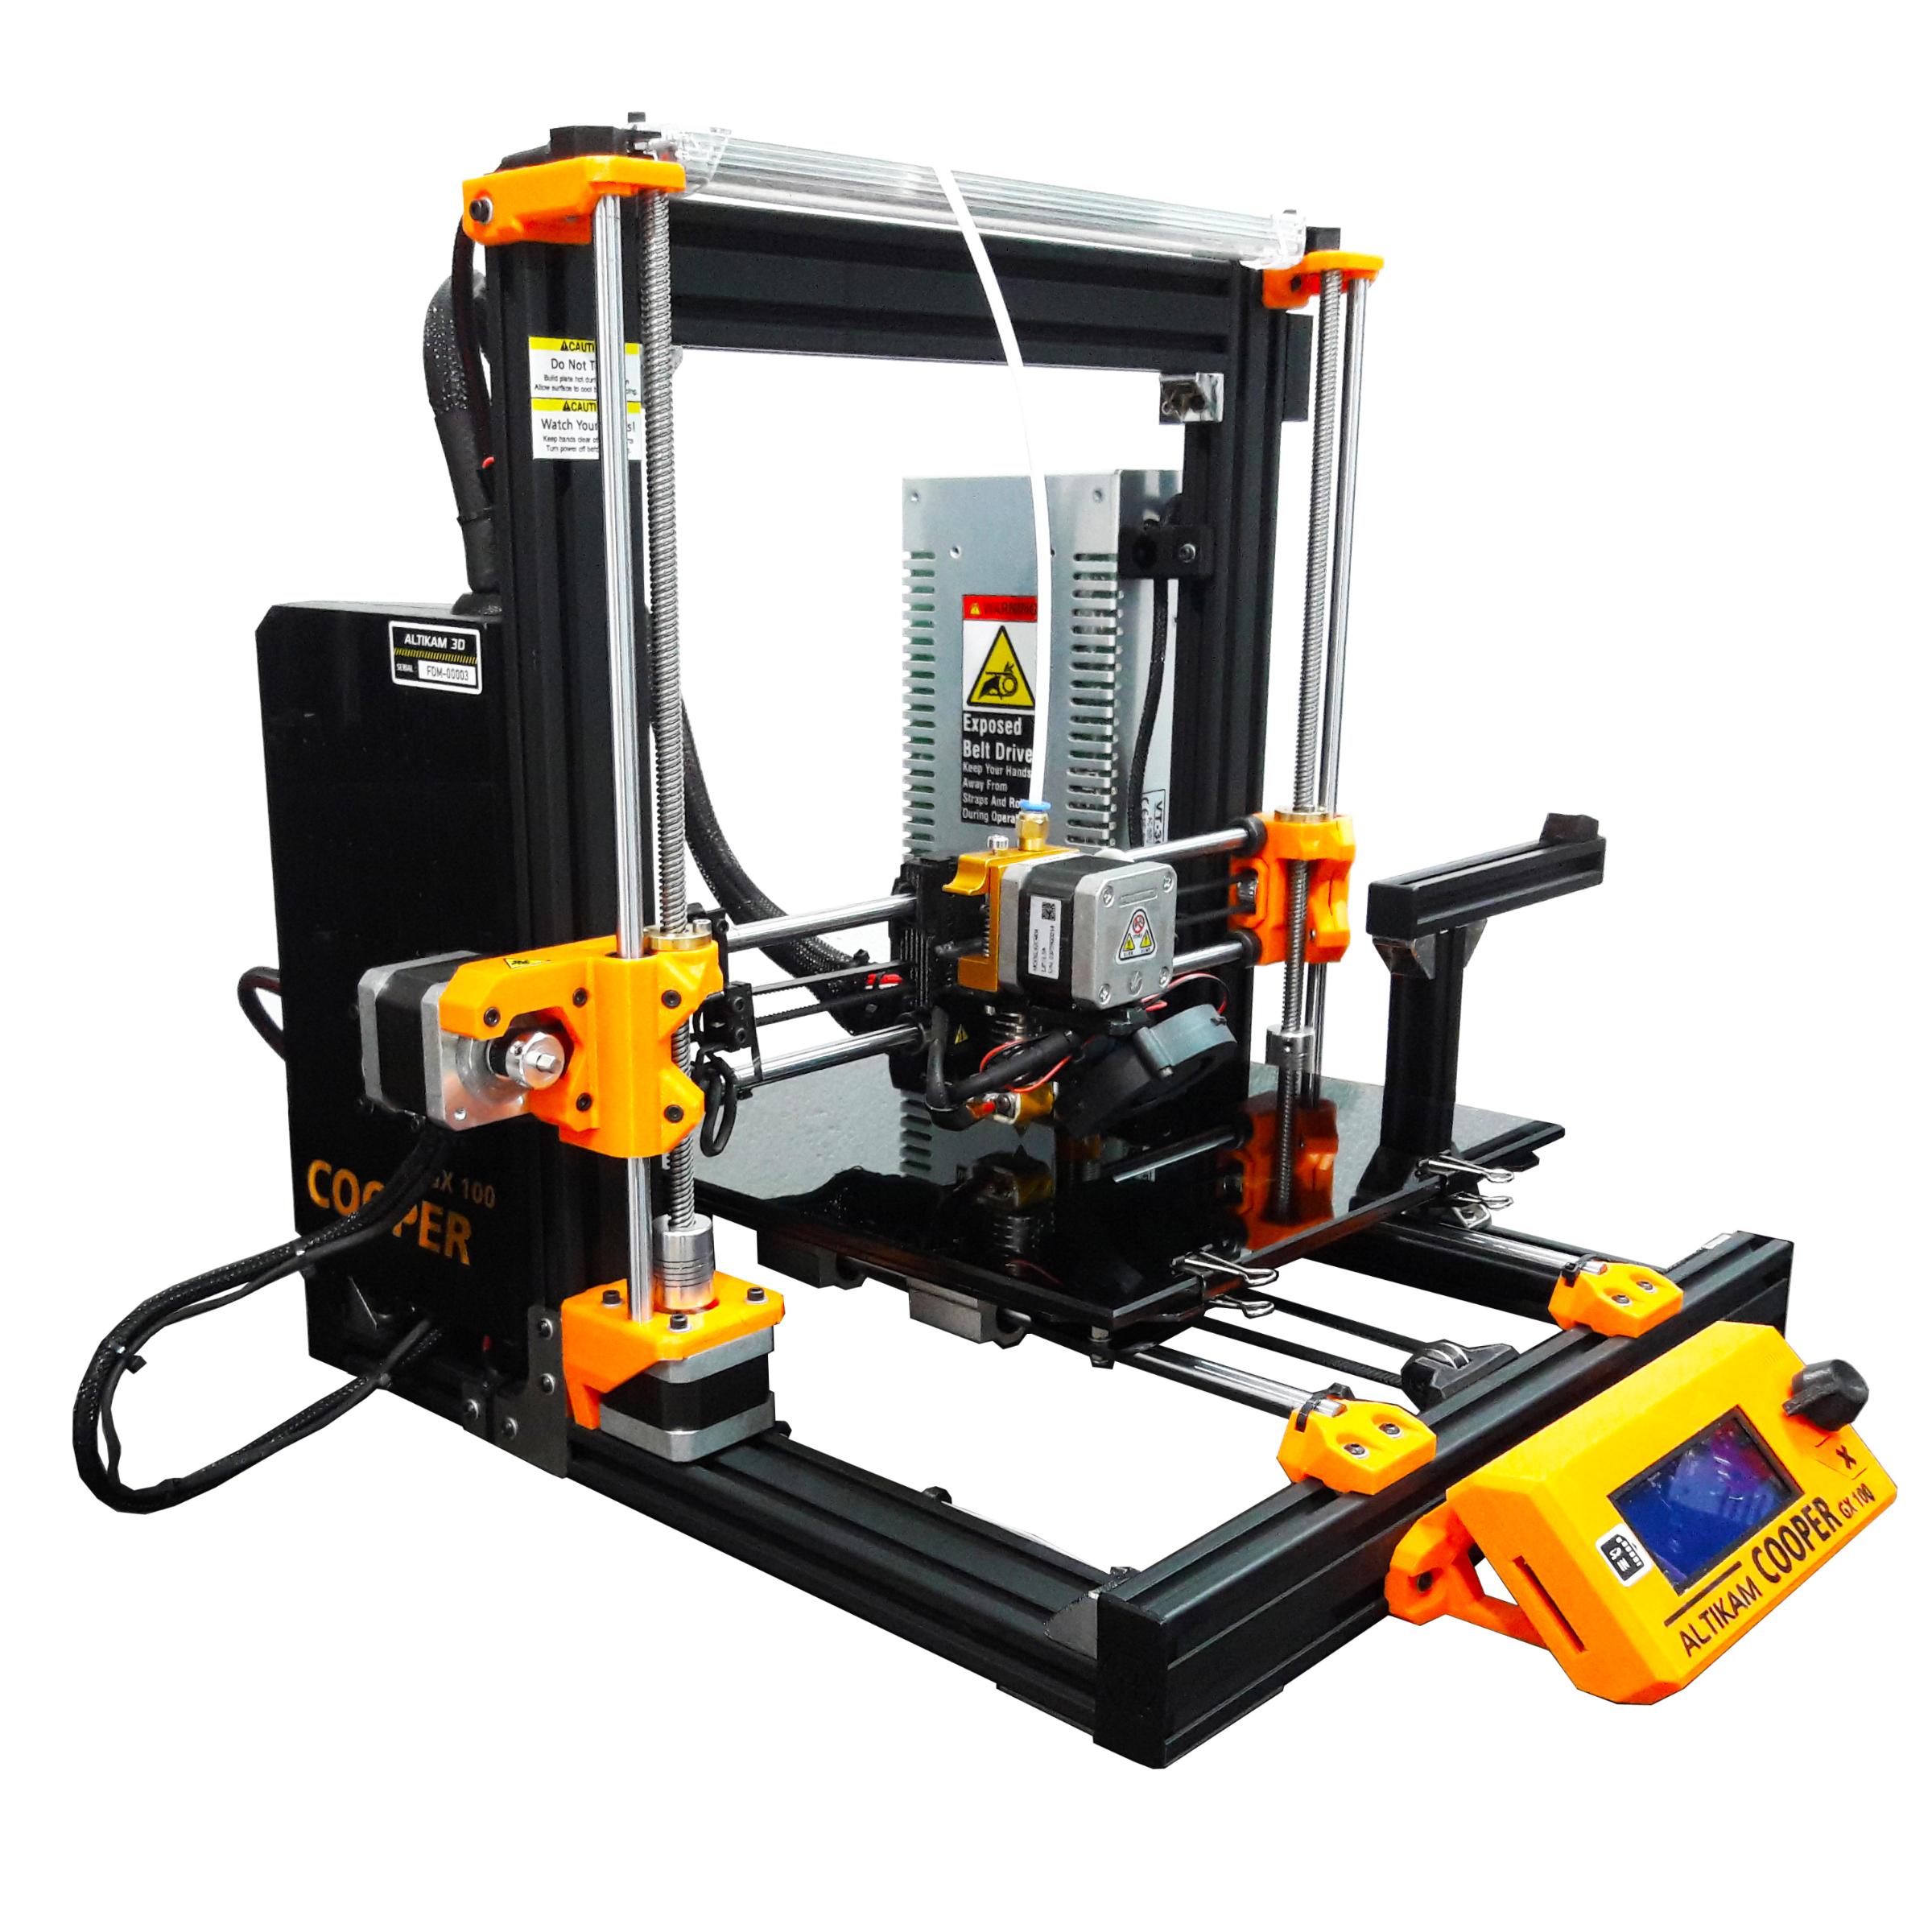 پرینتر سه بعدی آلتیکام مدل Cooper GX100